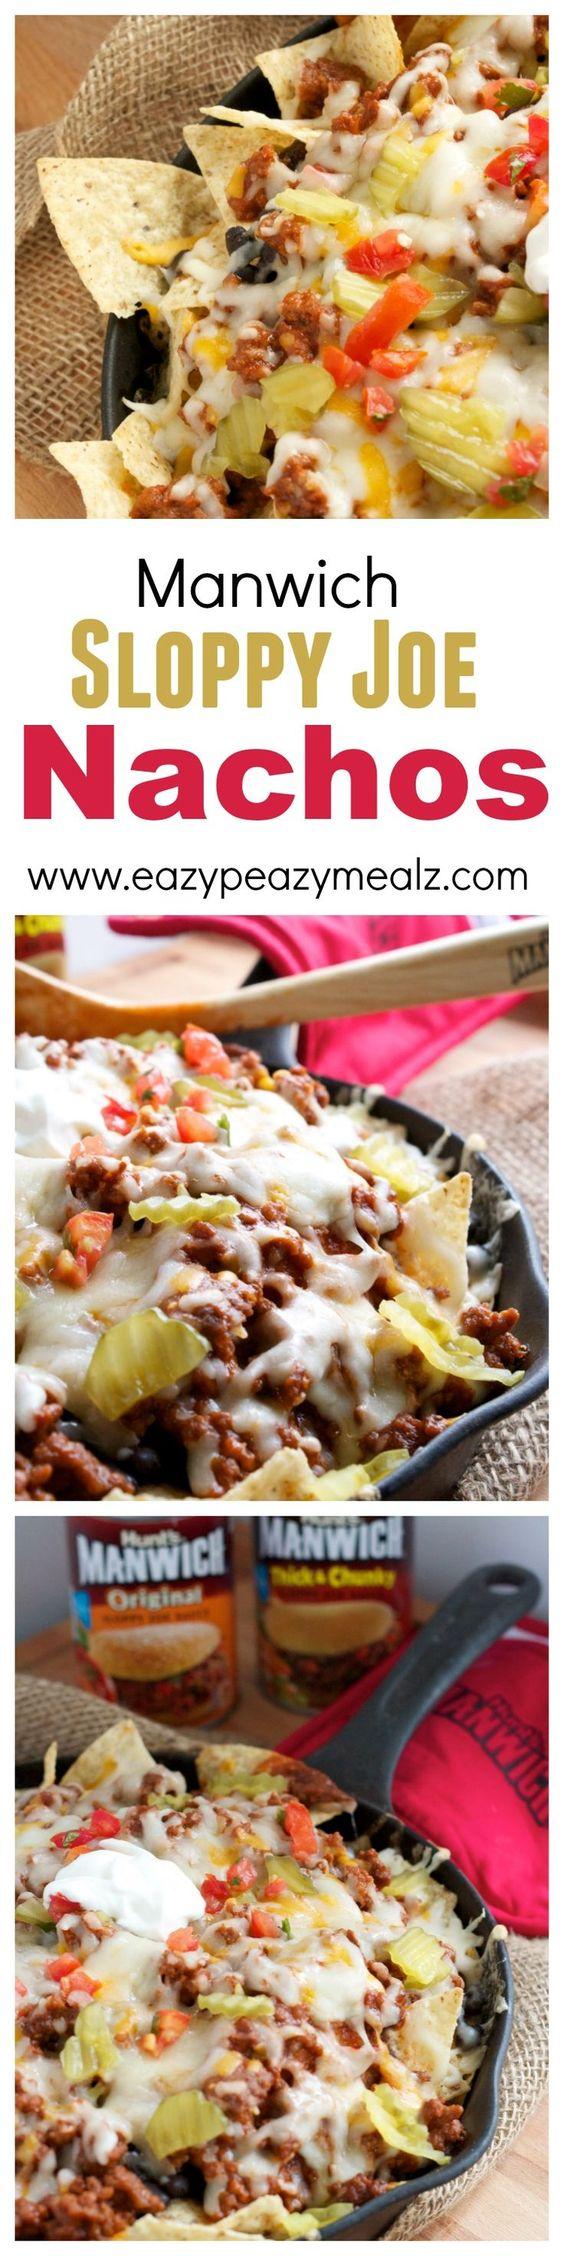 Sloppy joe nachos! Basically the best way to eat sloppy joes ever! And ...